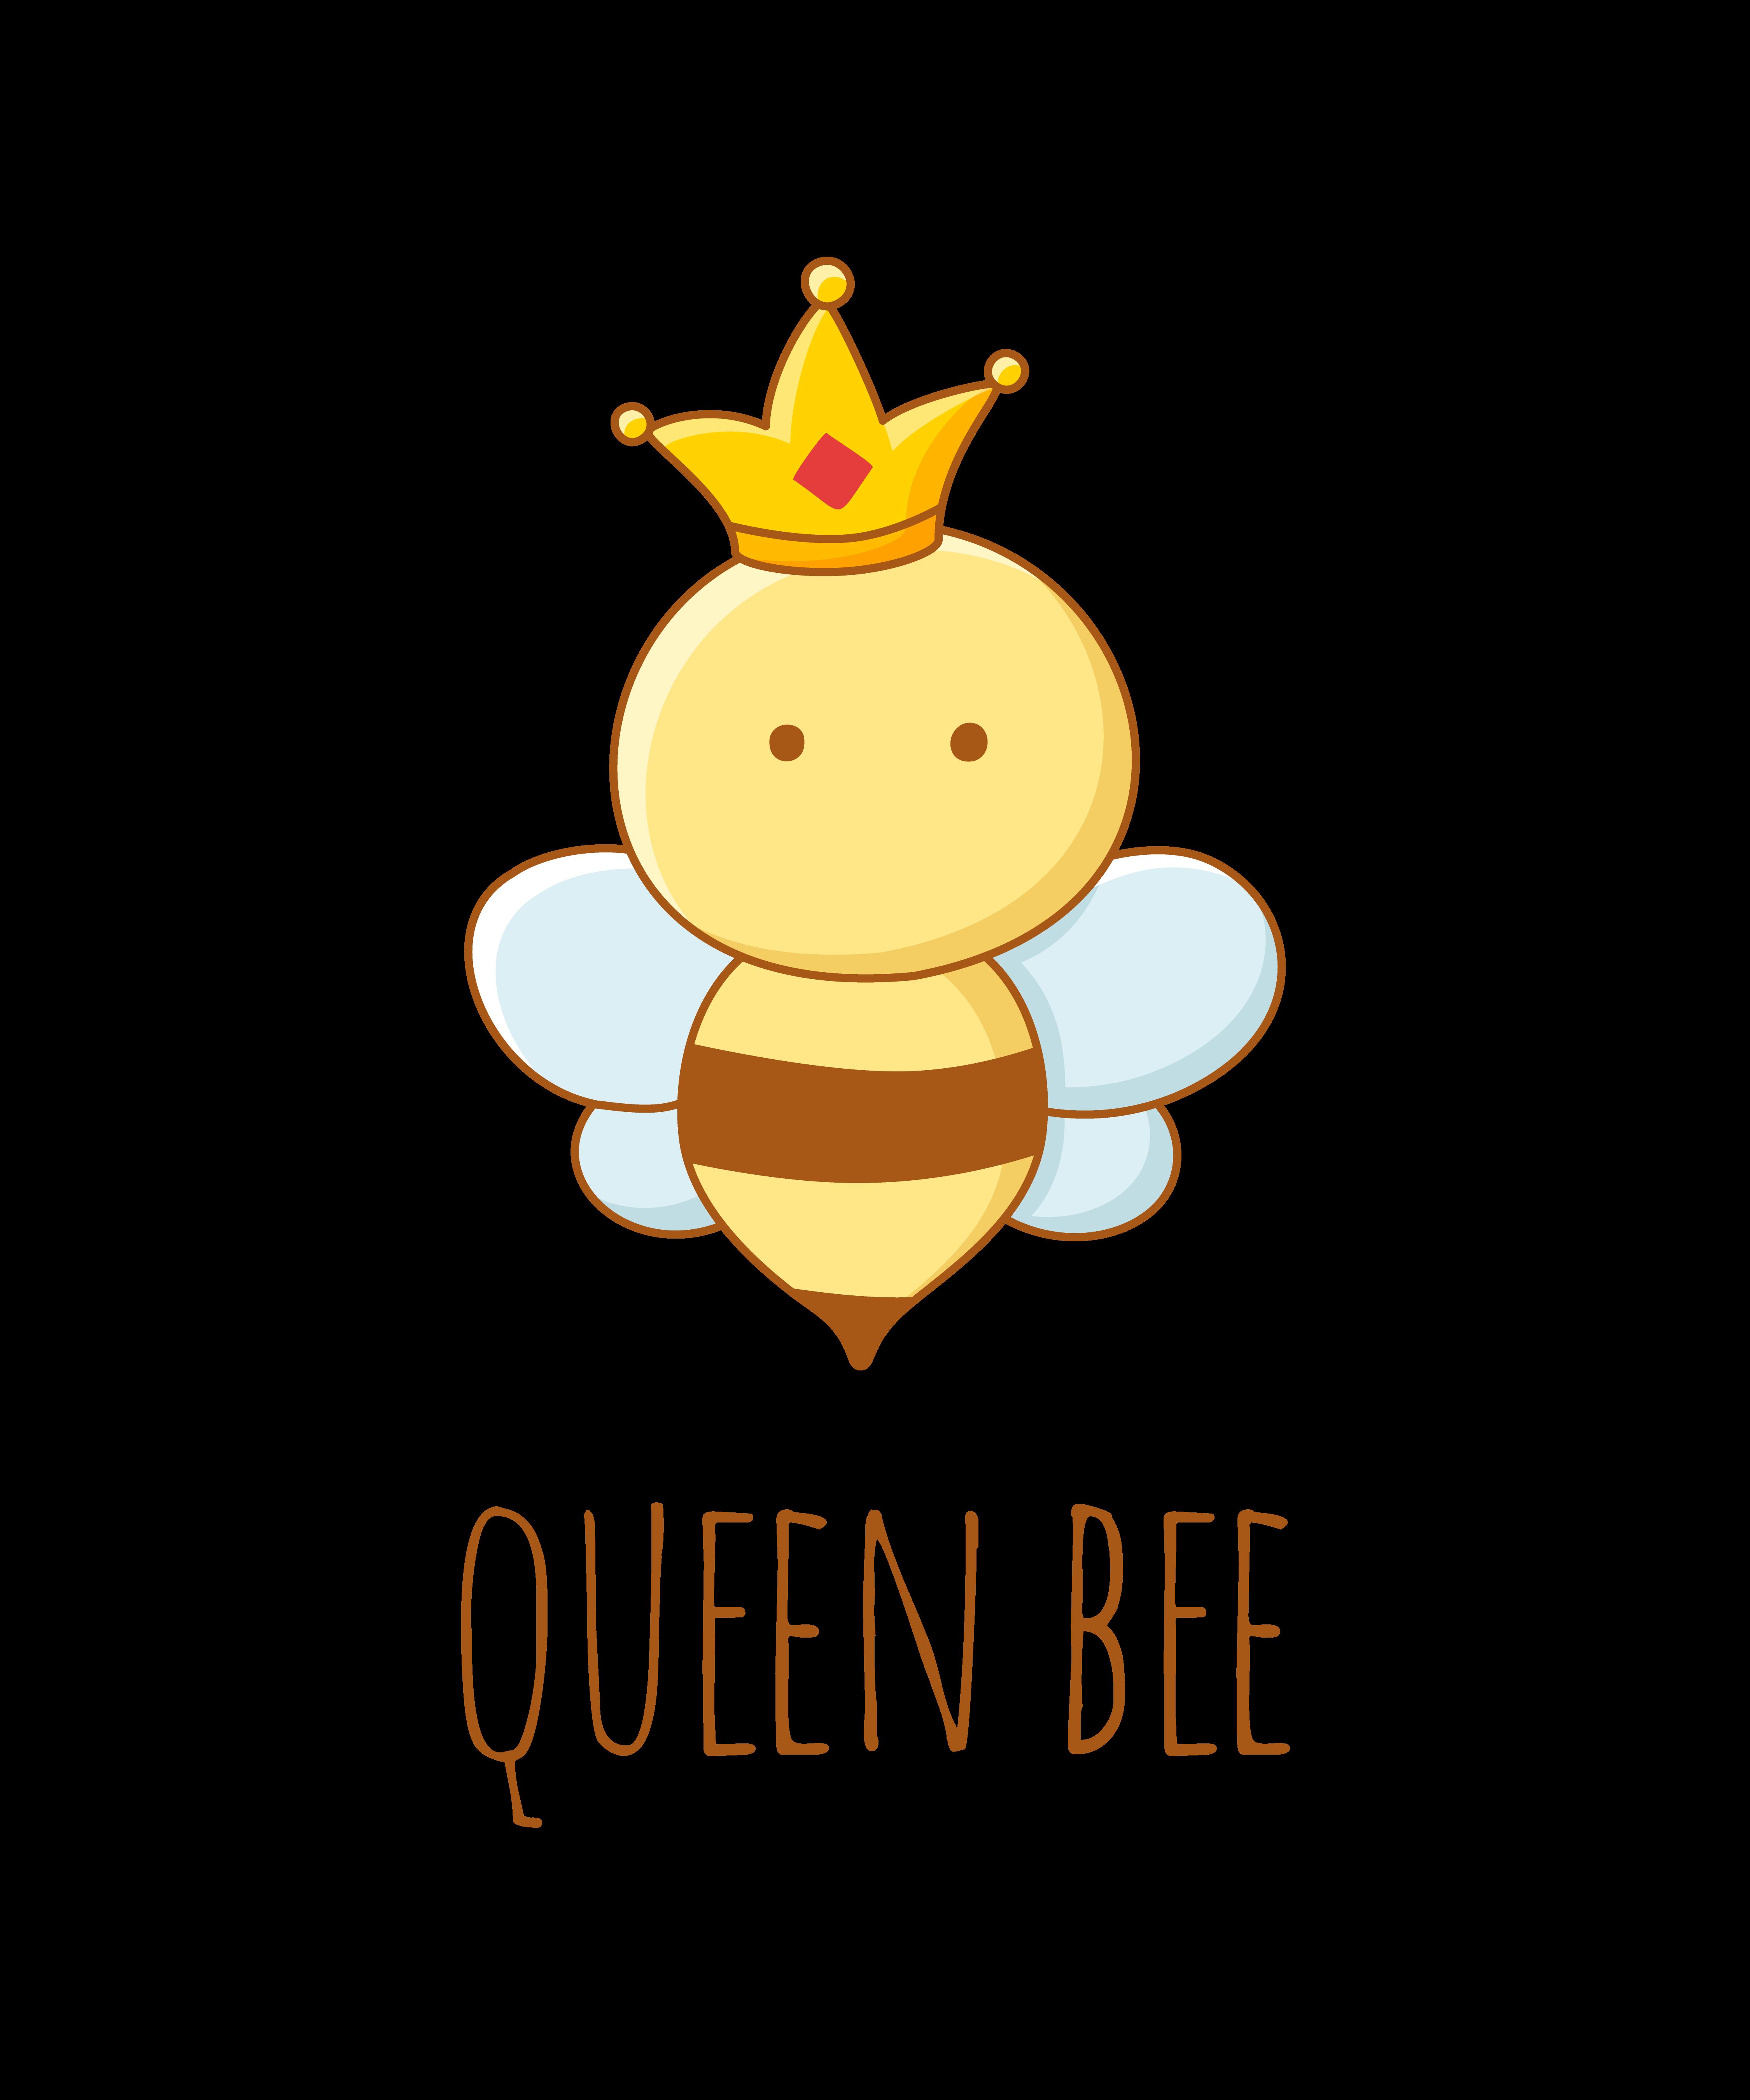 Queen Bee Funny Doodles Cute Puns Cute Cartoon Drawings